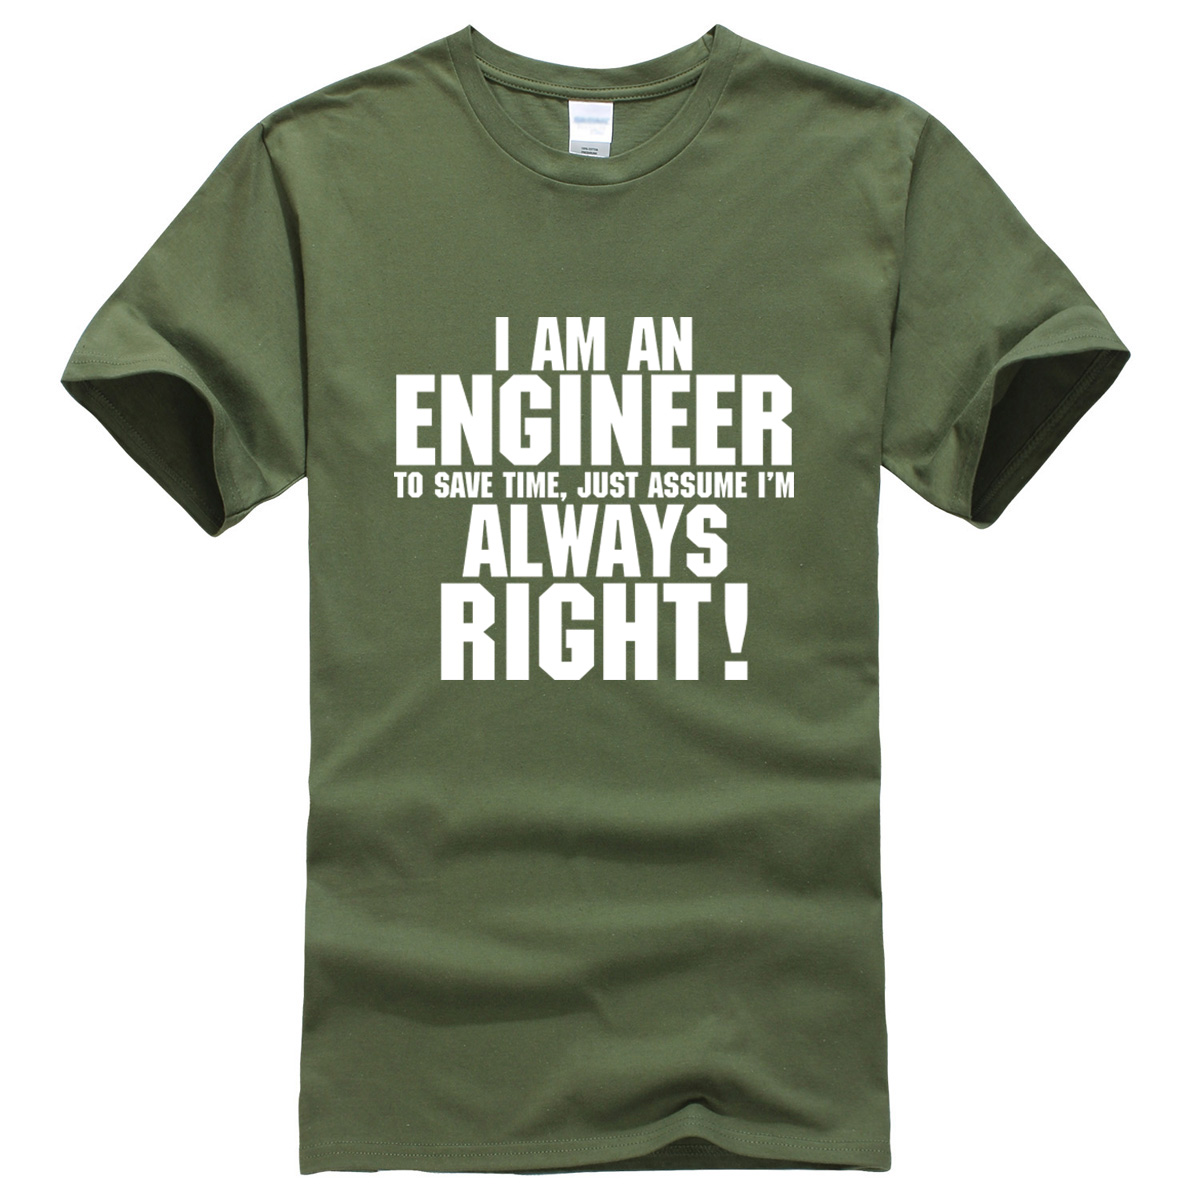 I AM AN ENGINEER printed letter summer 2019 men's T-shirts short sleeve cotton t shirt men harajuku jersey T-shirt free shipping